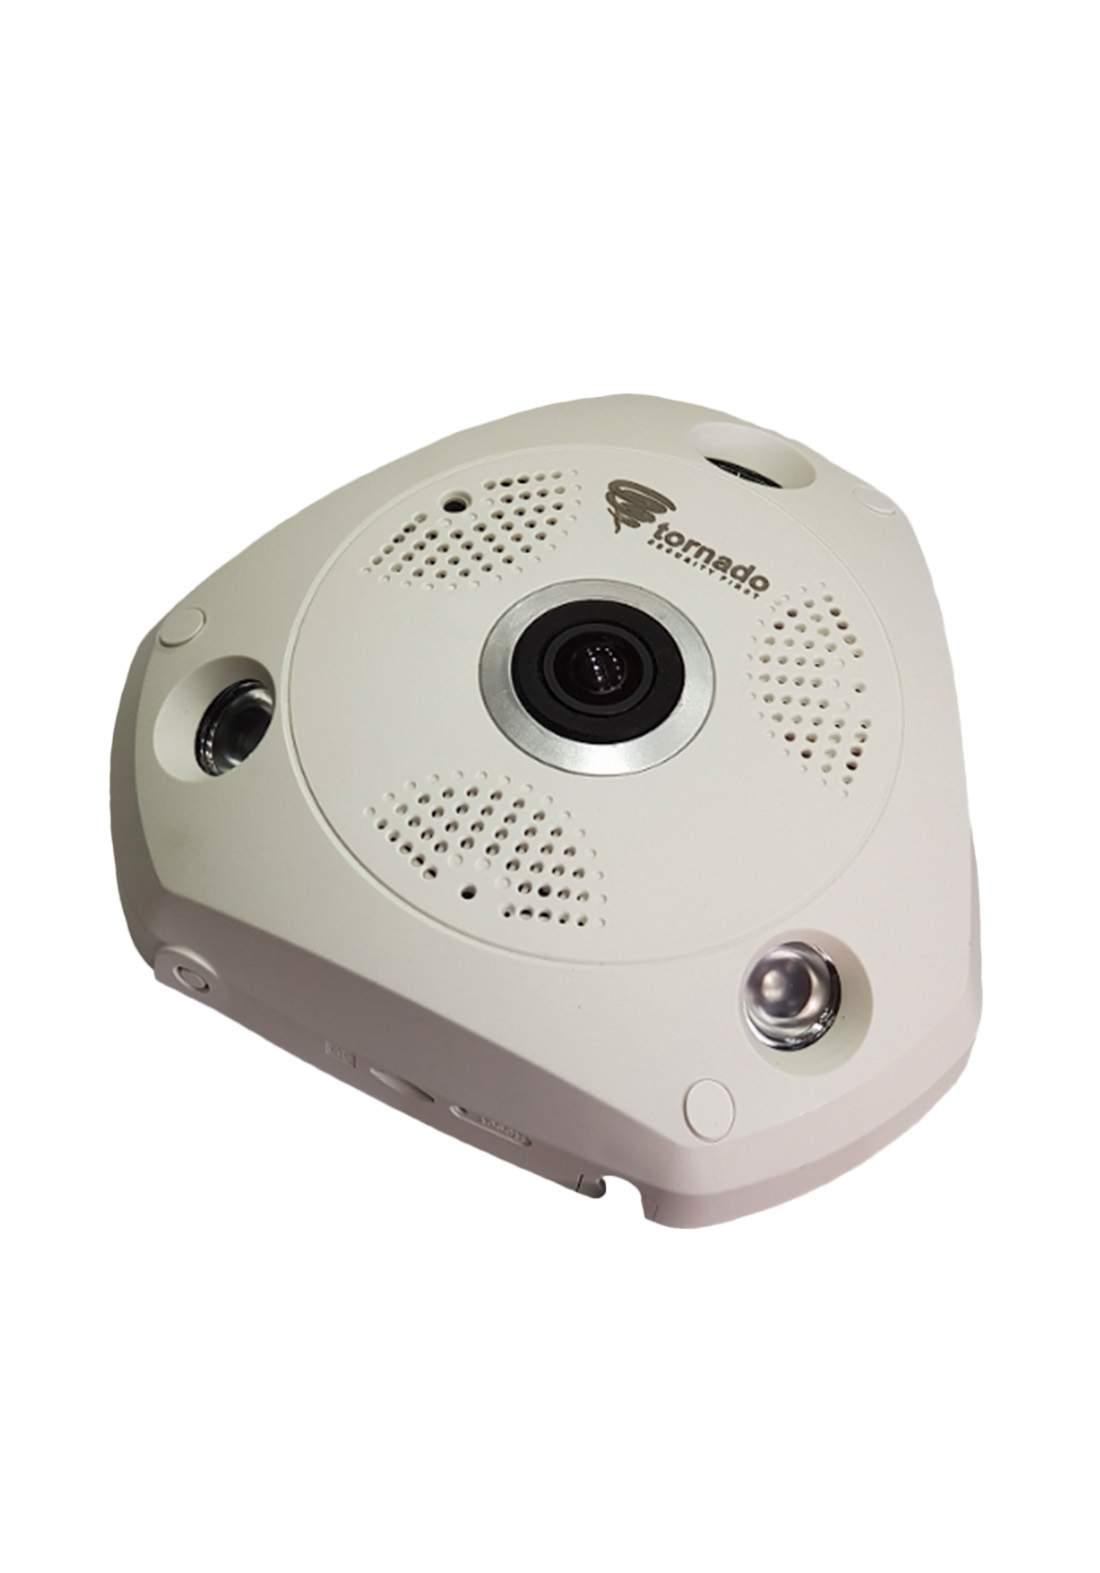 Tornado AHD 2mp Panorama Security Camera - White  كاميرا